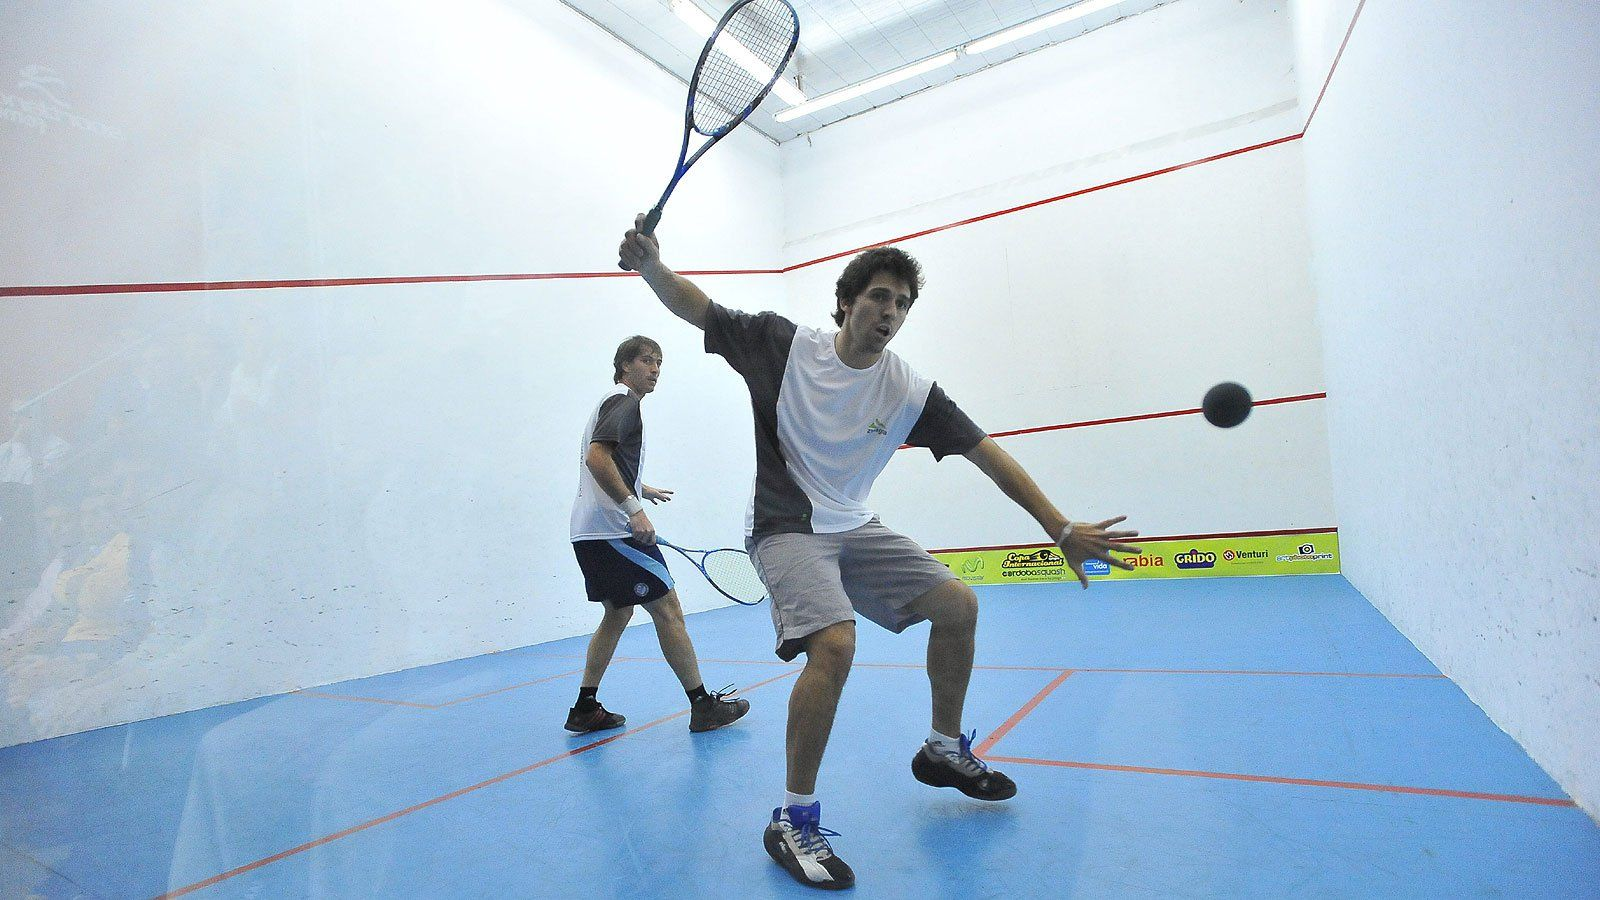 Squash deporte olímpico